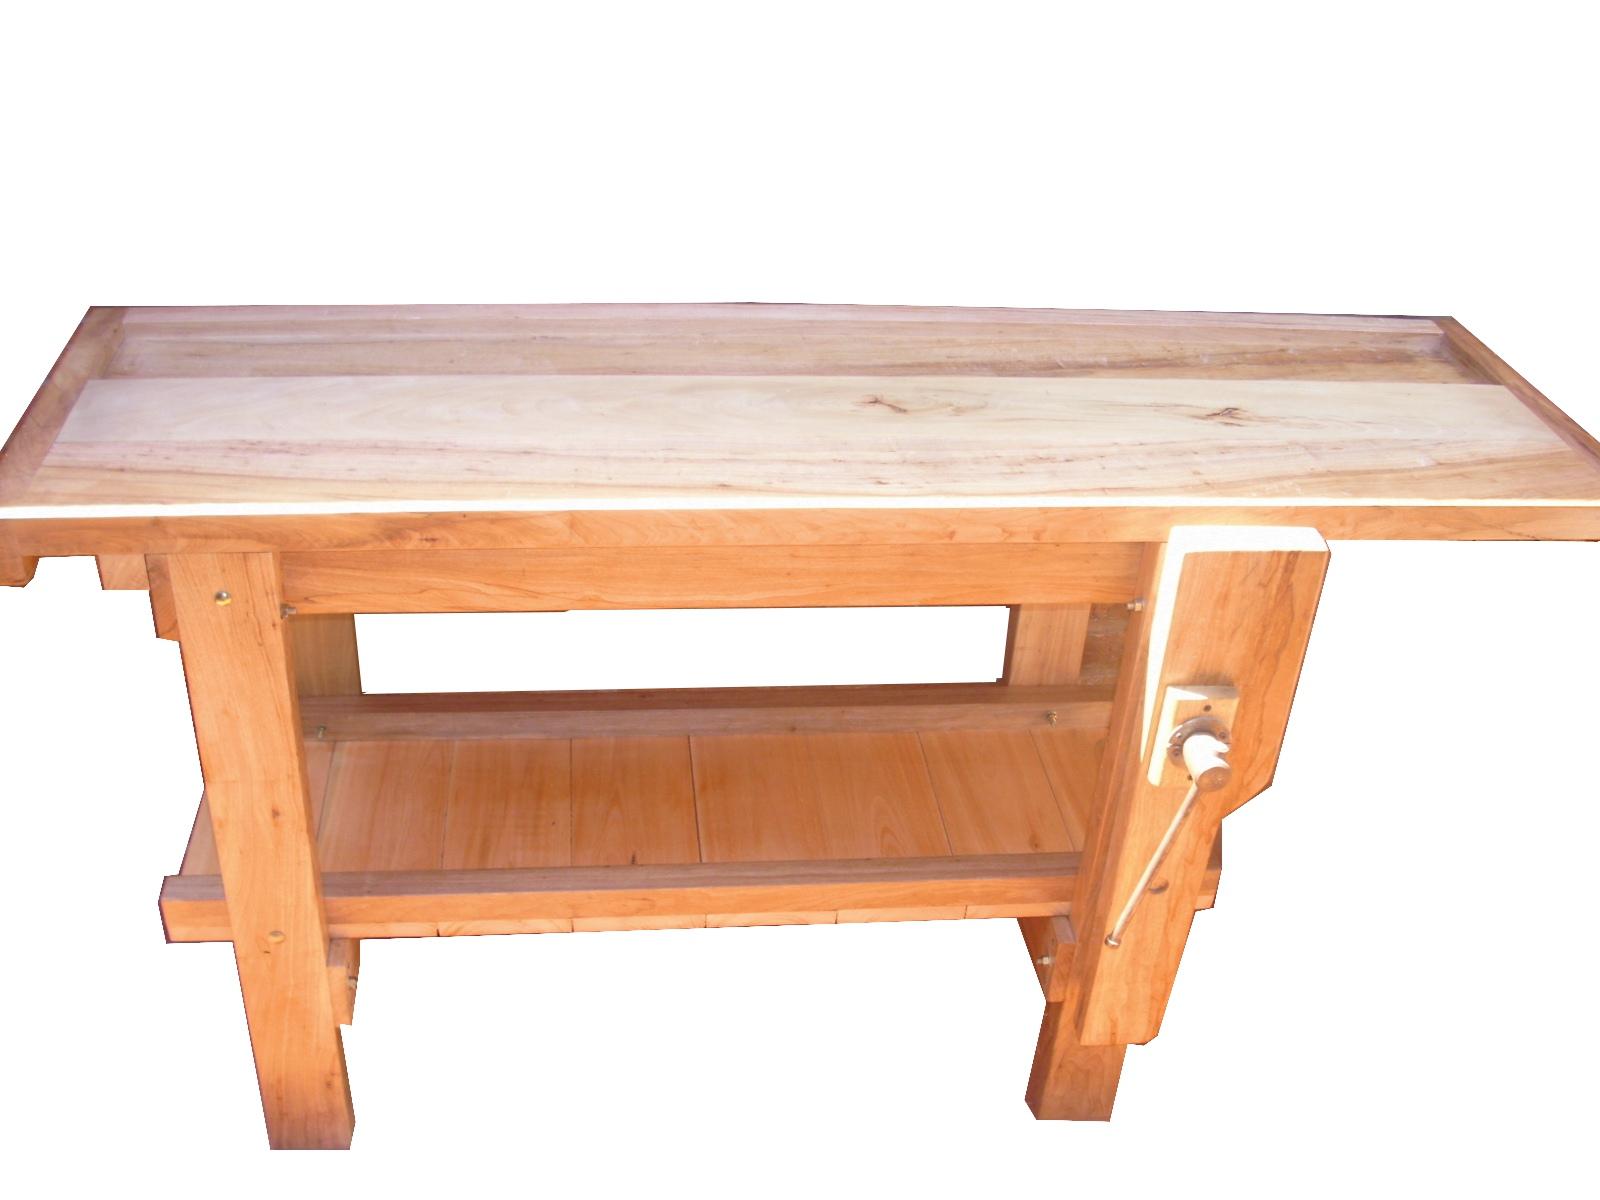 Carpintero de madera trendy aosst intereses de carpintero - Carpintero de madera ...